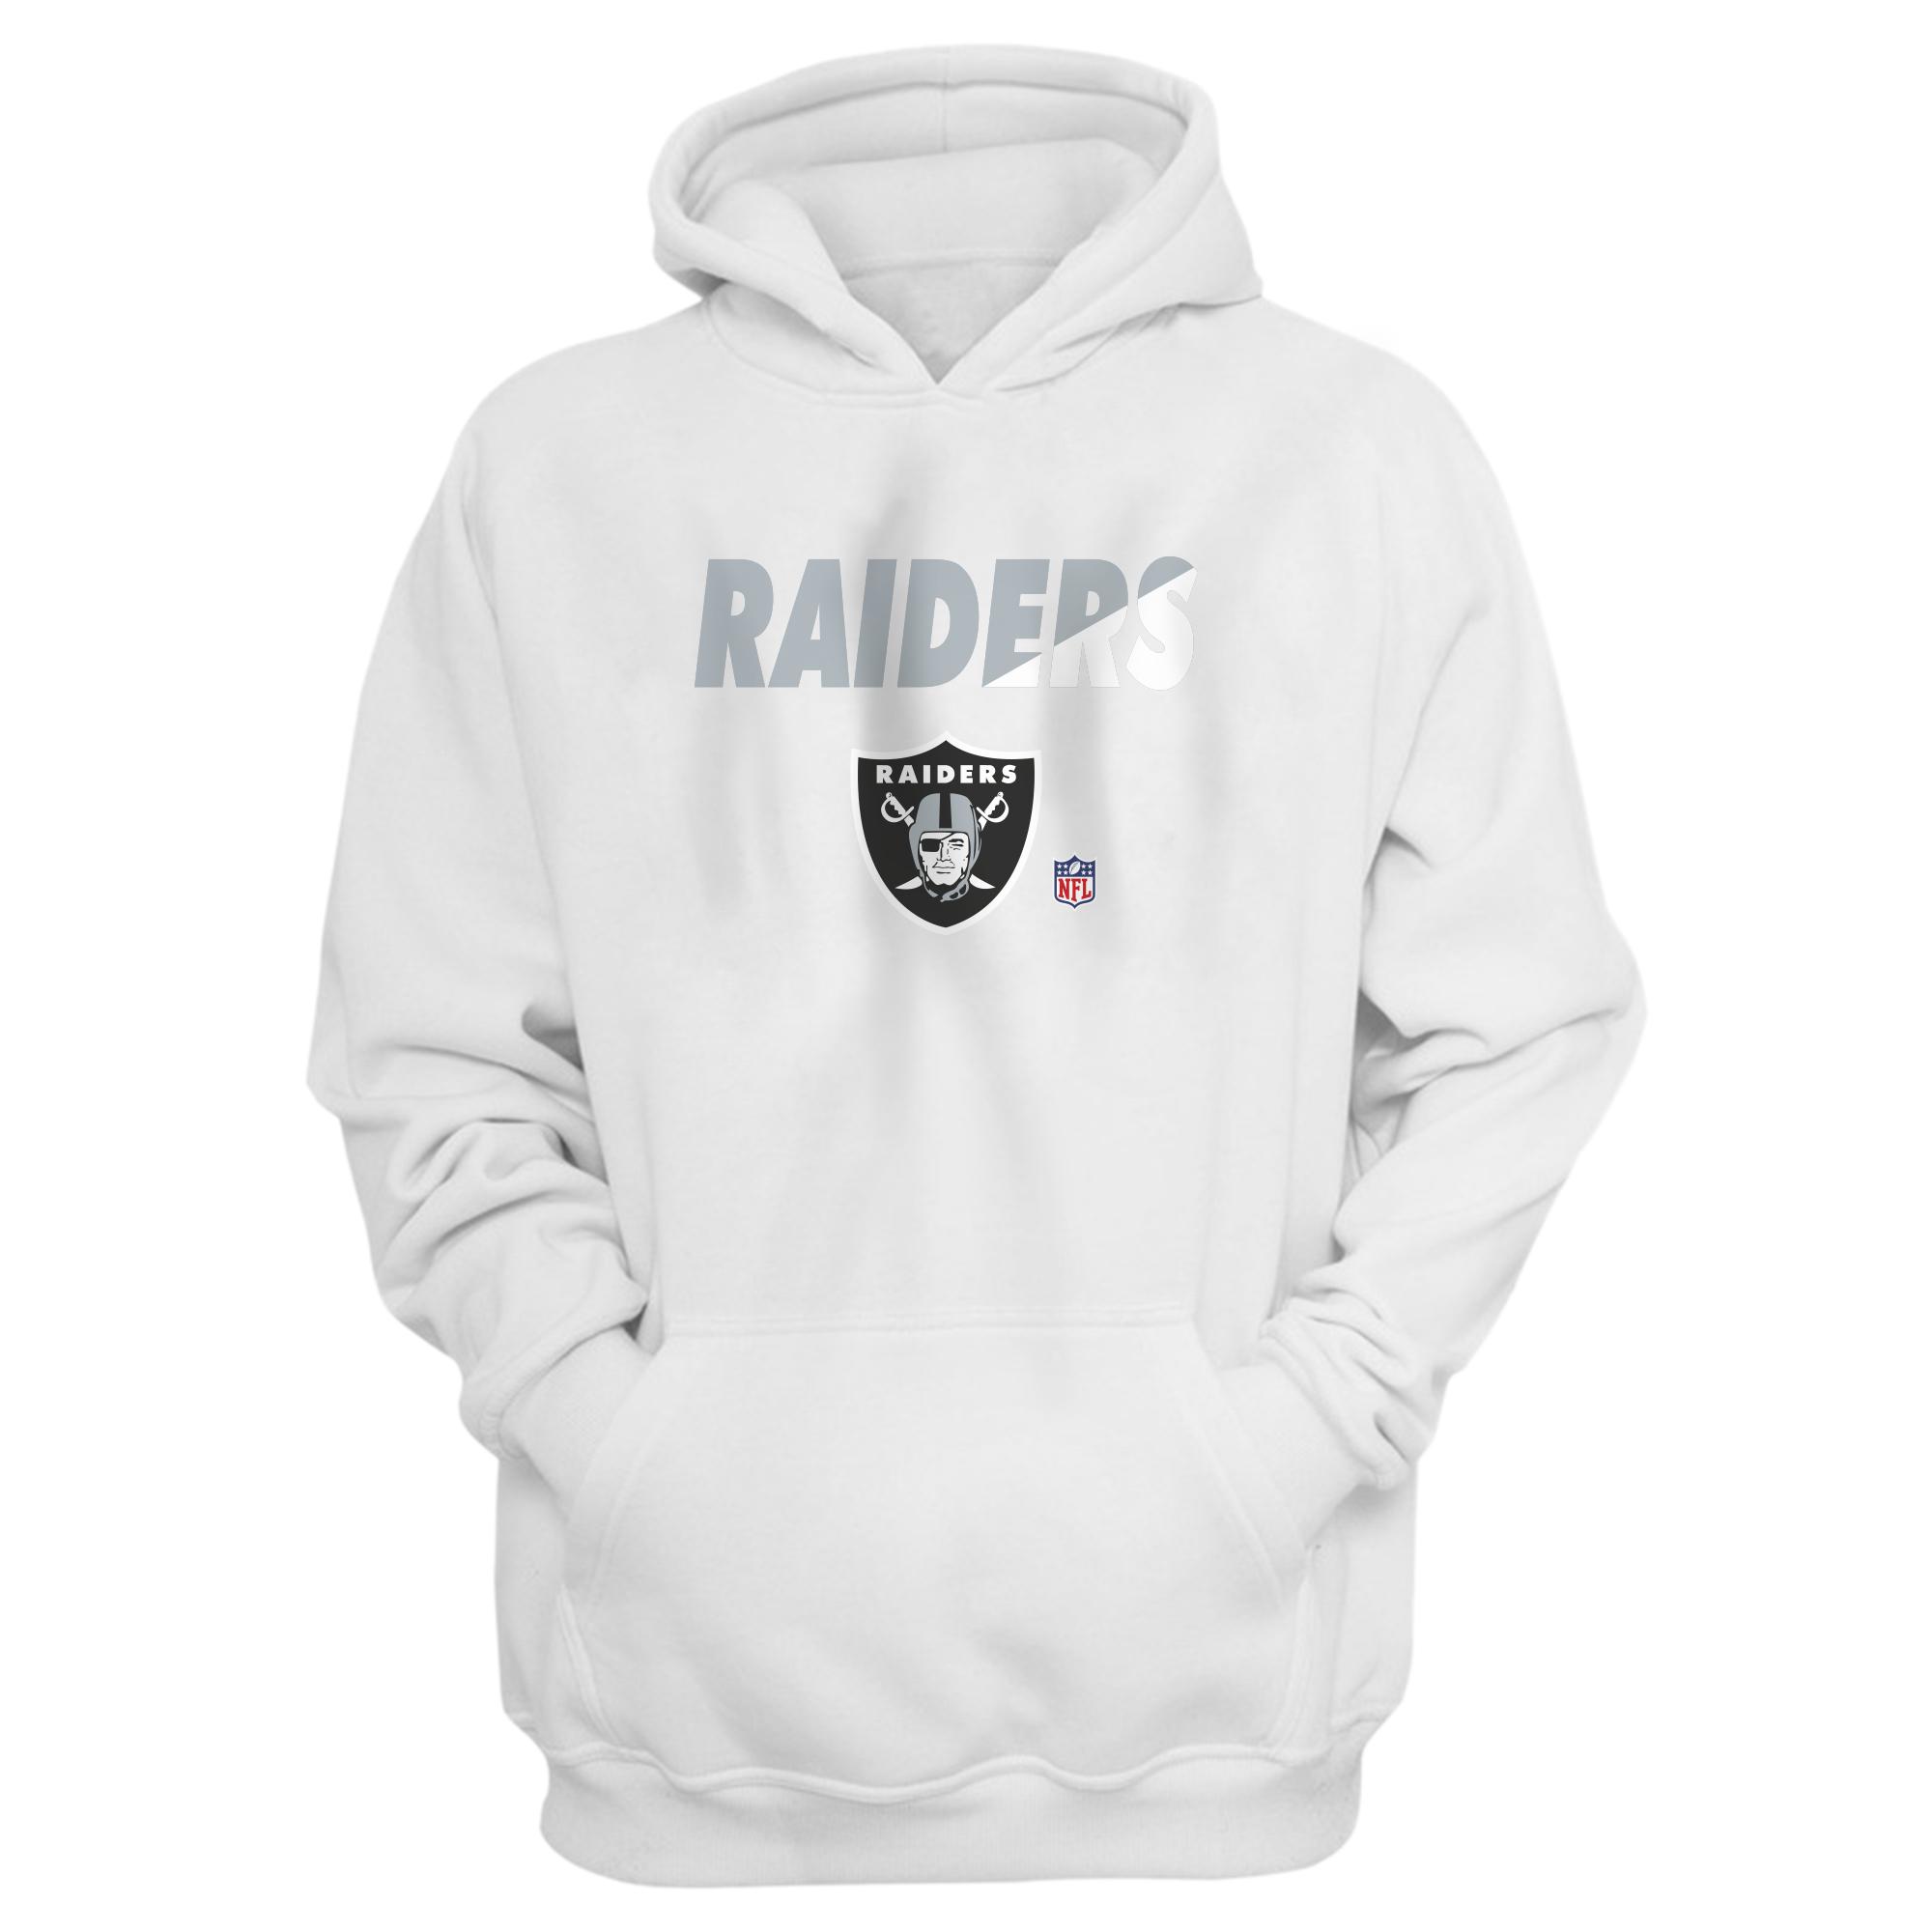 Oakland Raiders Hoodie (HD-WHT-NP-214-NFL-OAK-RAIDERS)